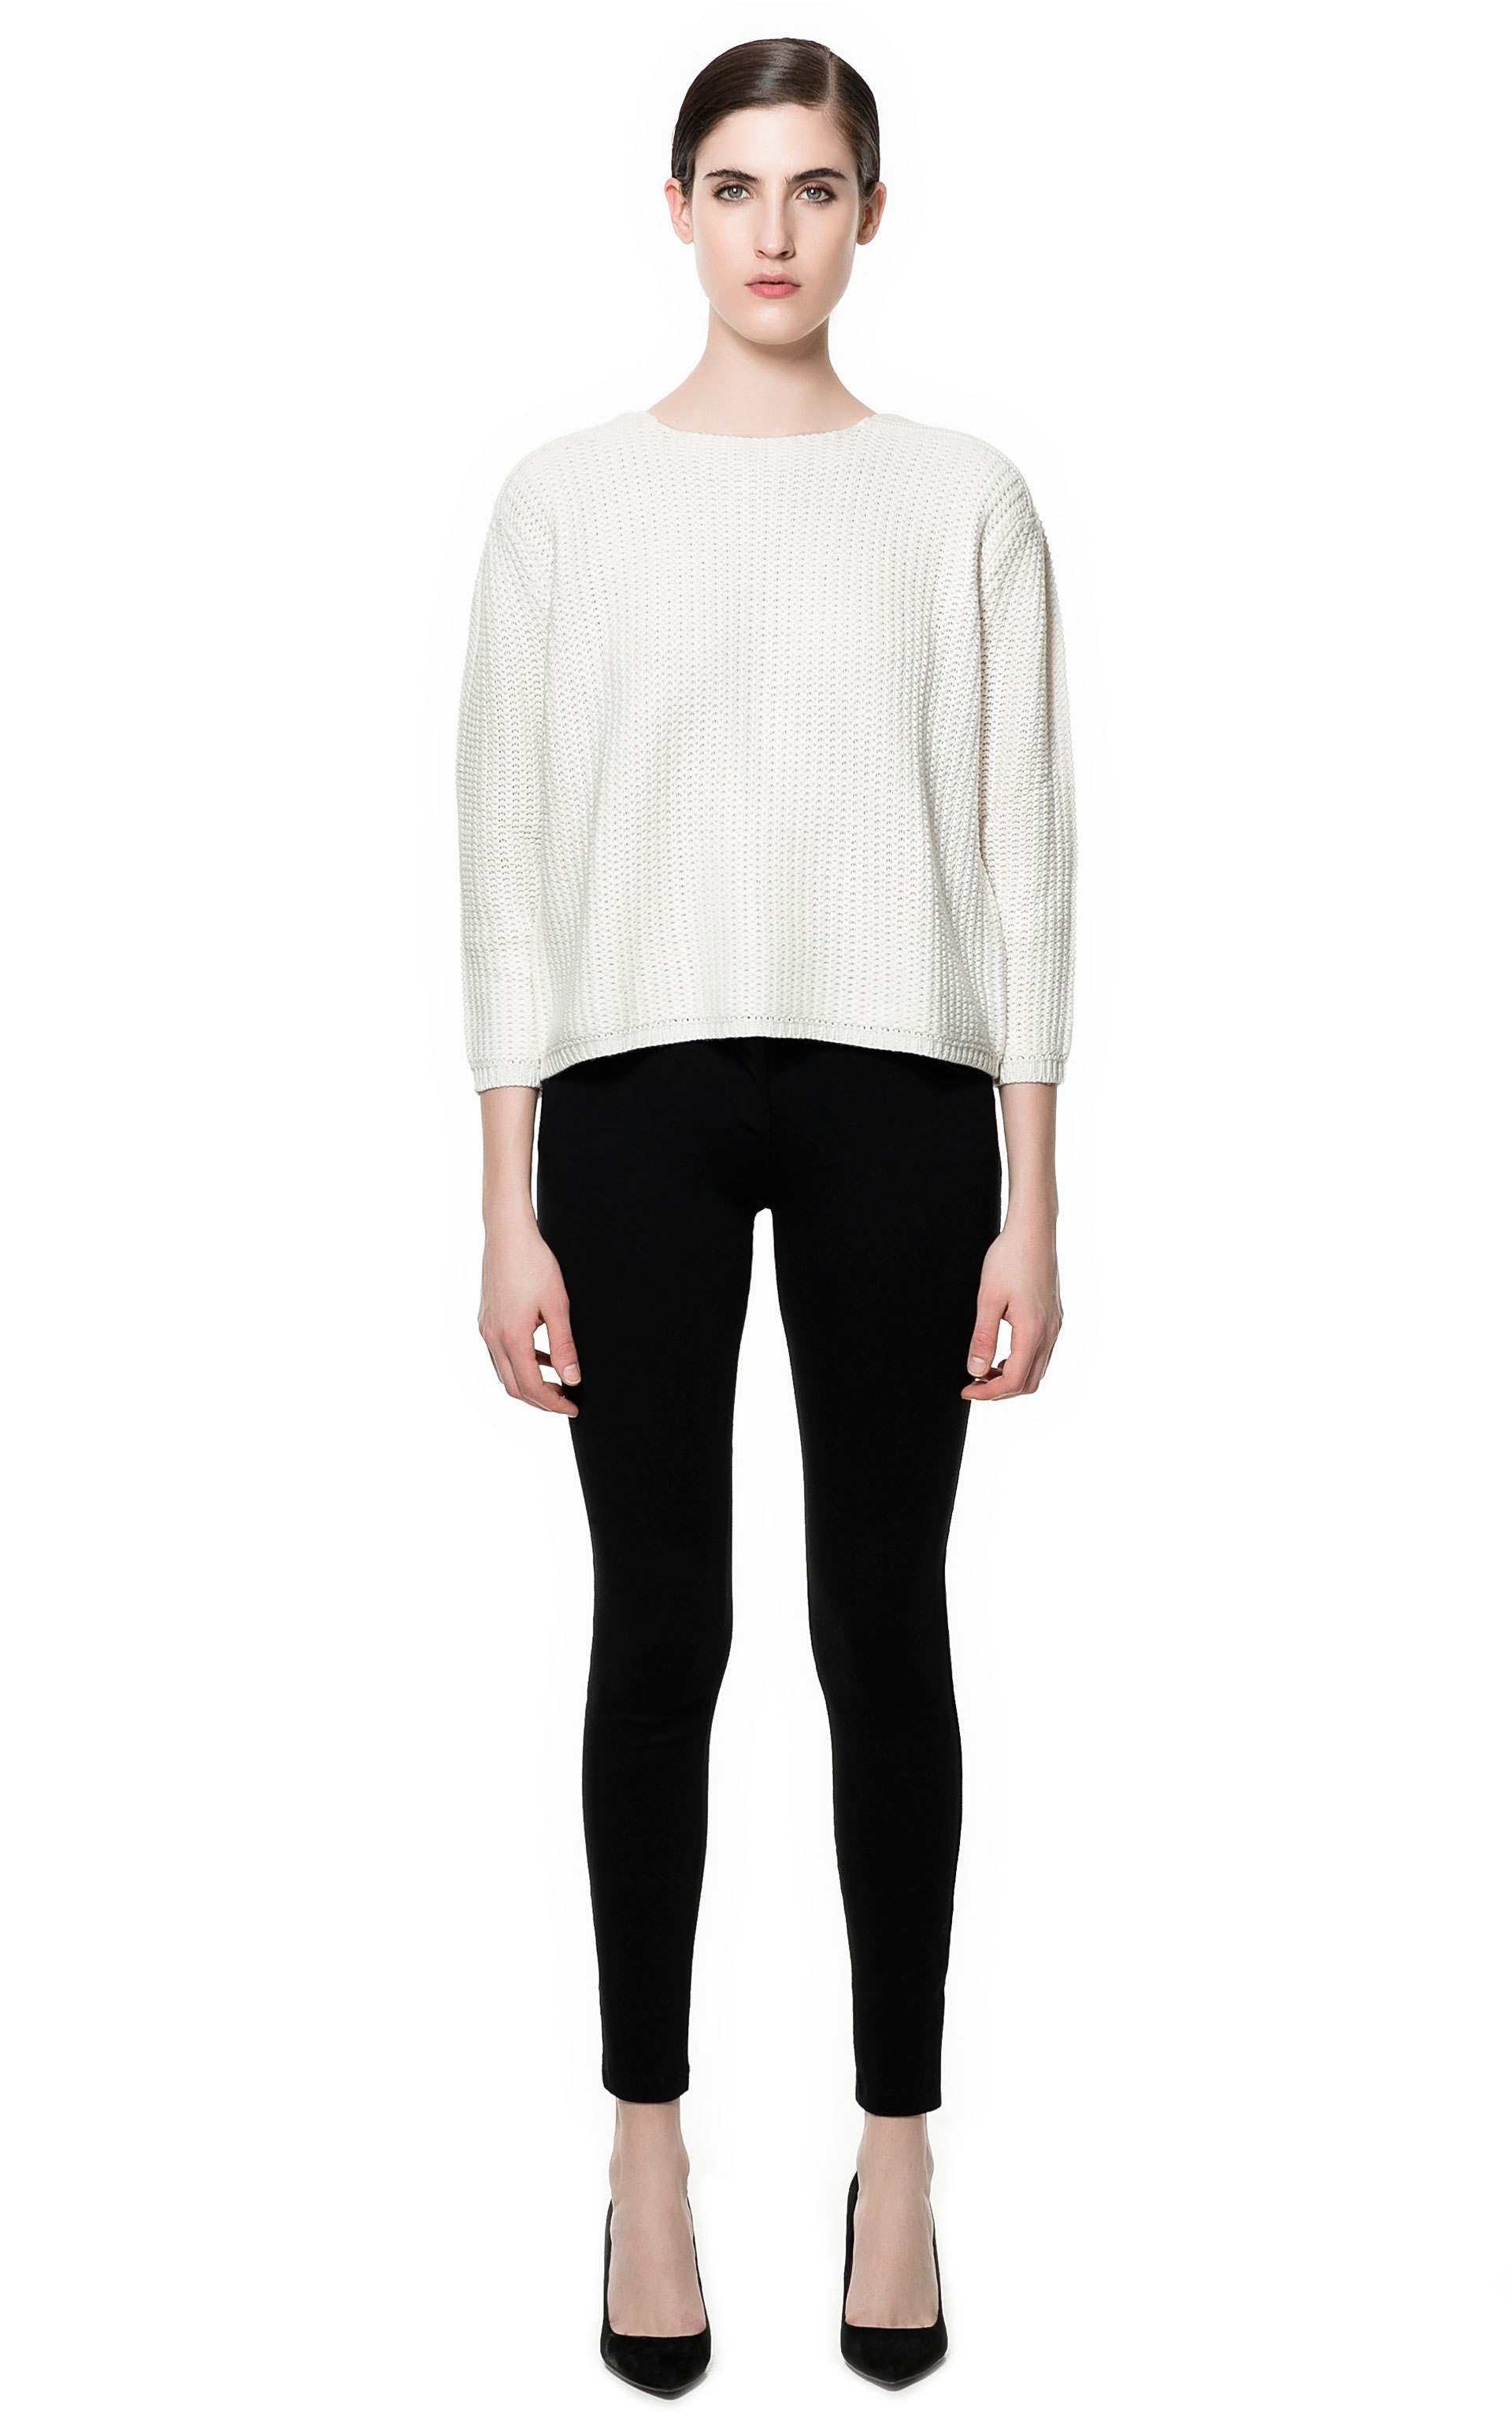 Innovative Women39s Faux Leather Pants Women39s Black Leather Pants